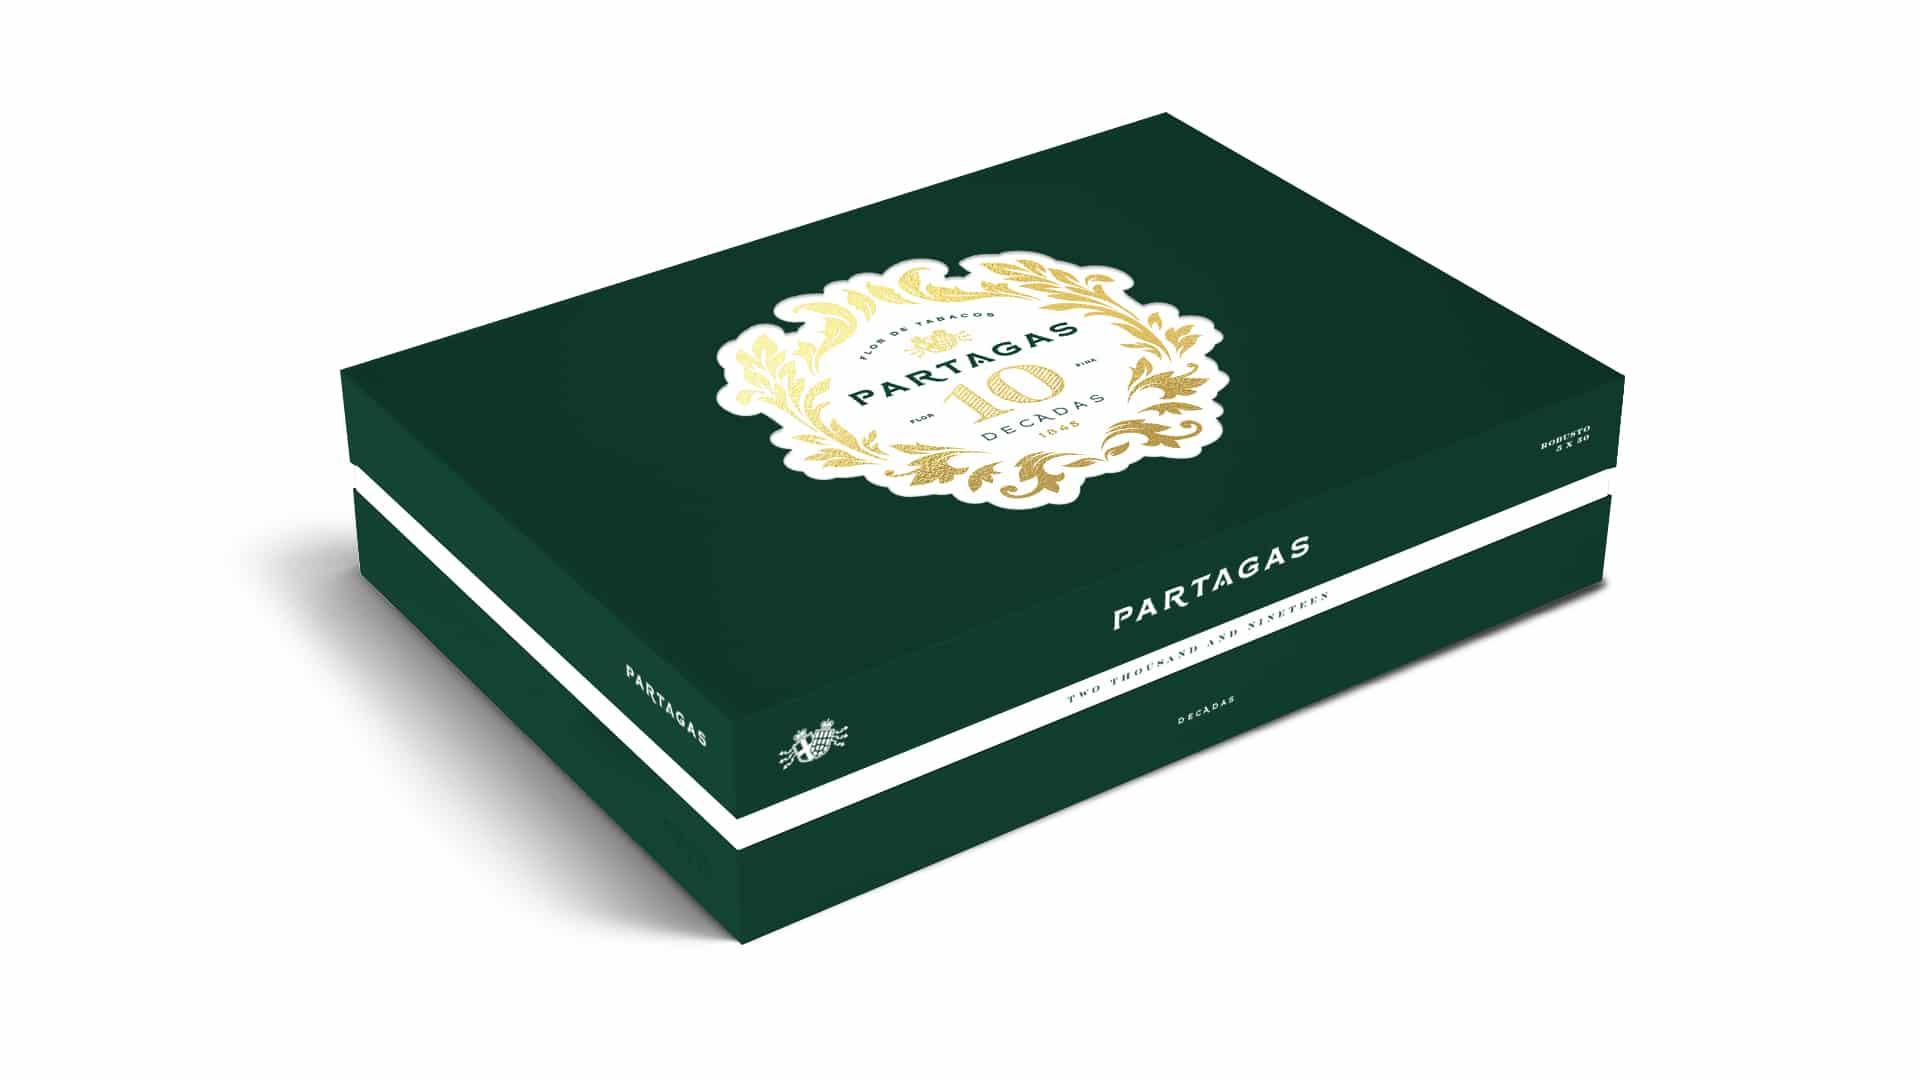 Partagas Limited Reserve Decadas 2019 cigar box